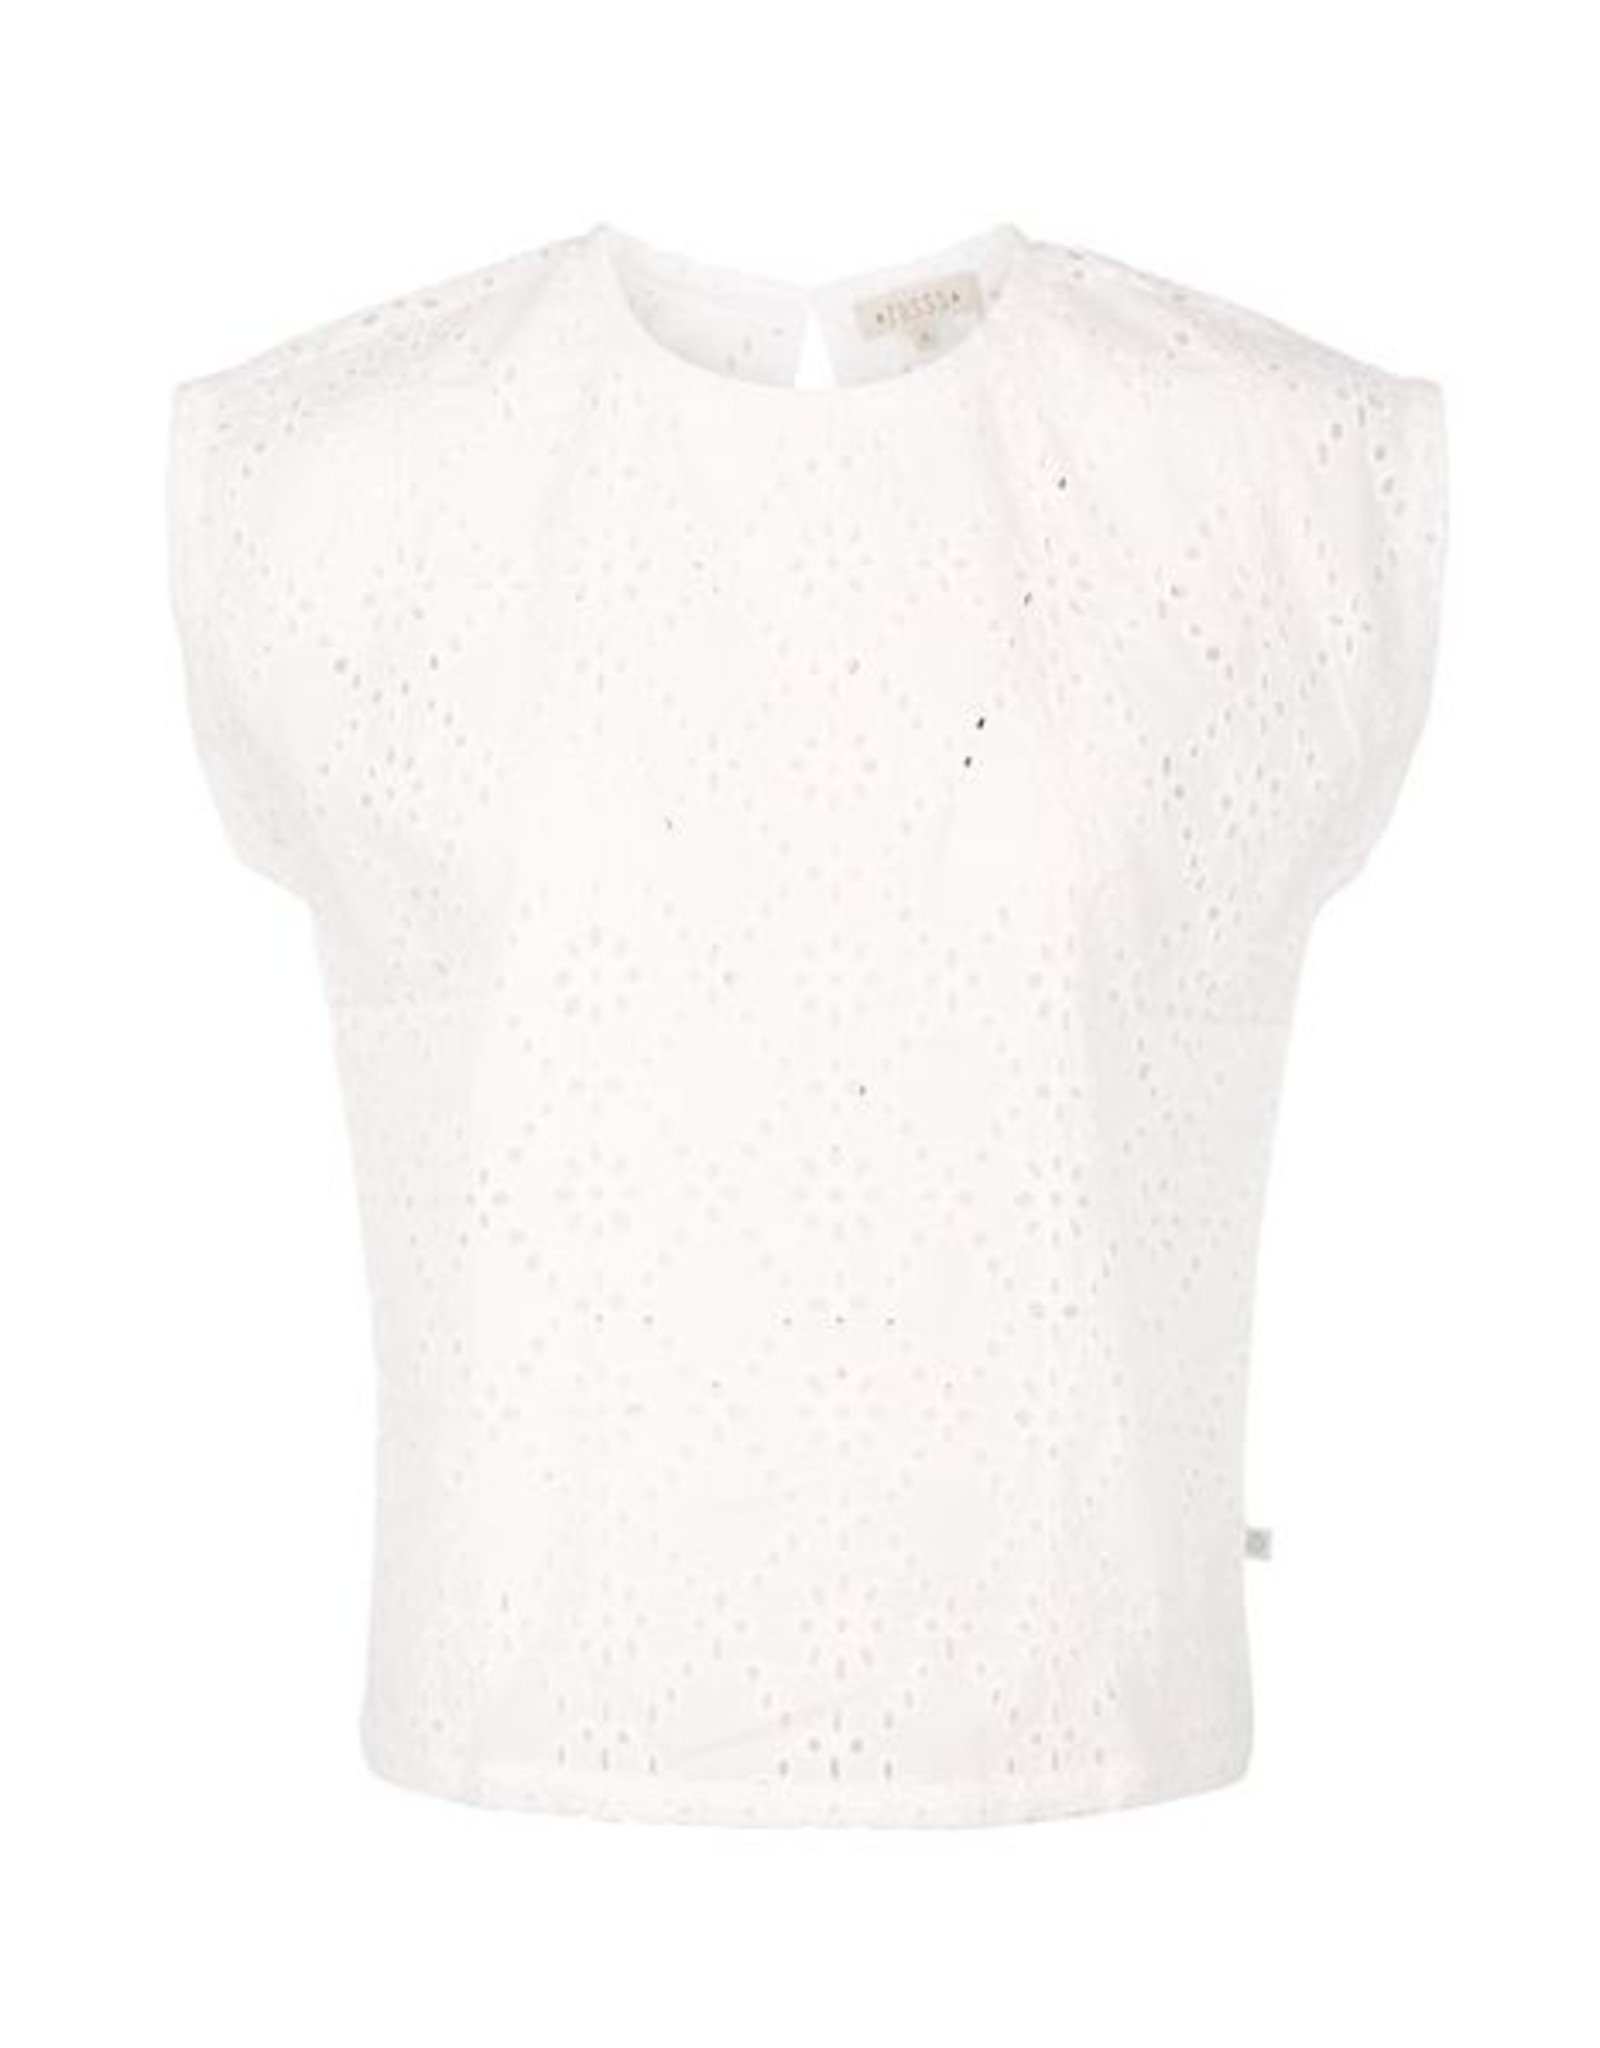 Zusss Broderie blouseje wit